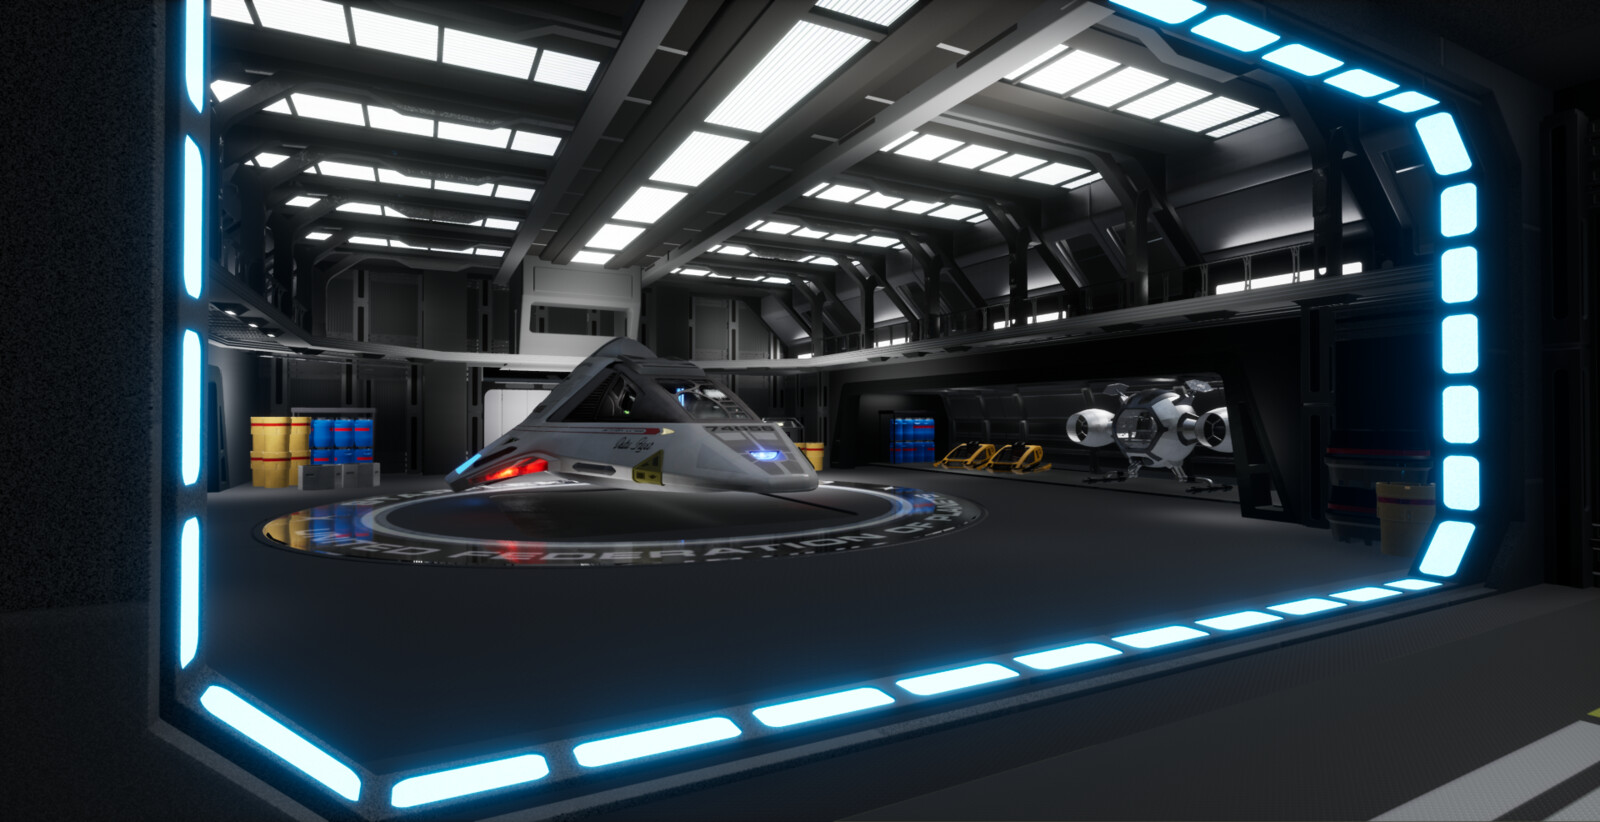 Voyager mainshuttlebay prototype